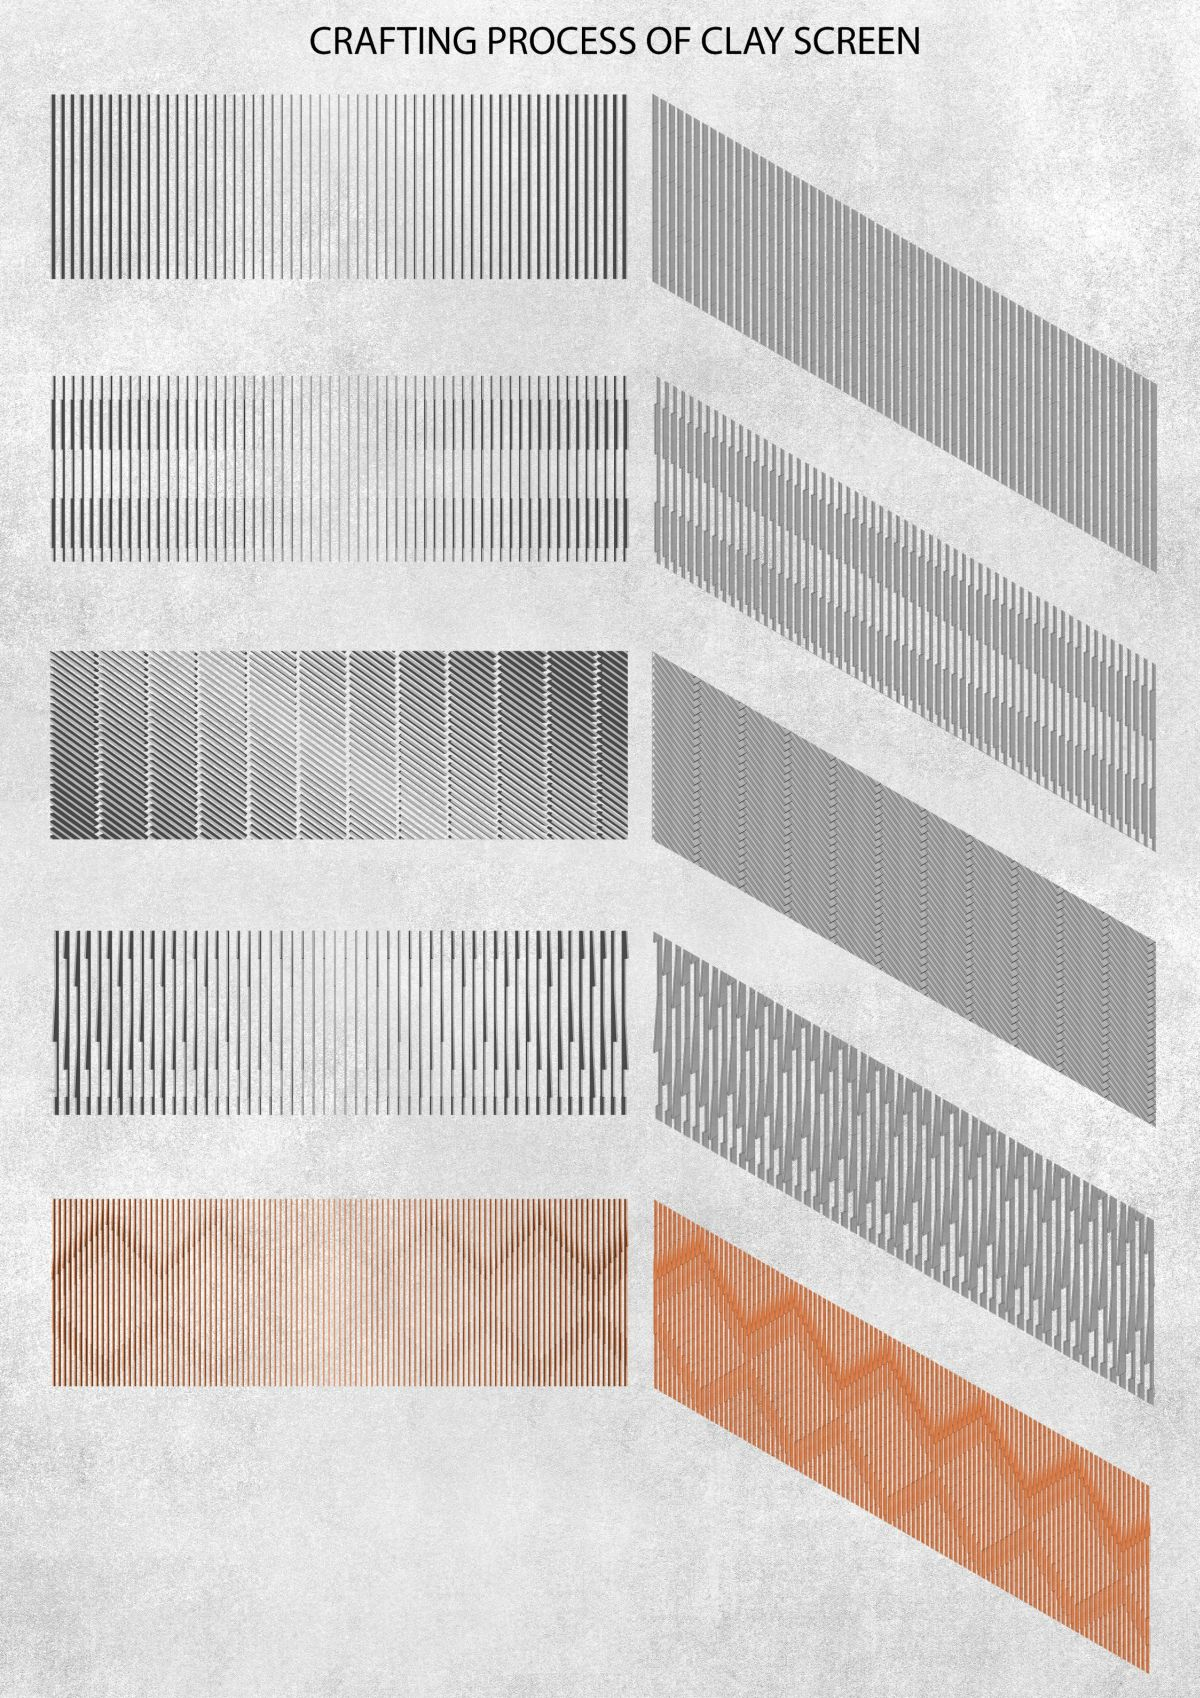 Clay roof tiles façade to minimize heat gain and has decorative function, at Vadodara, by Manoj Patel Design Studio 101